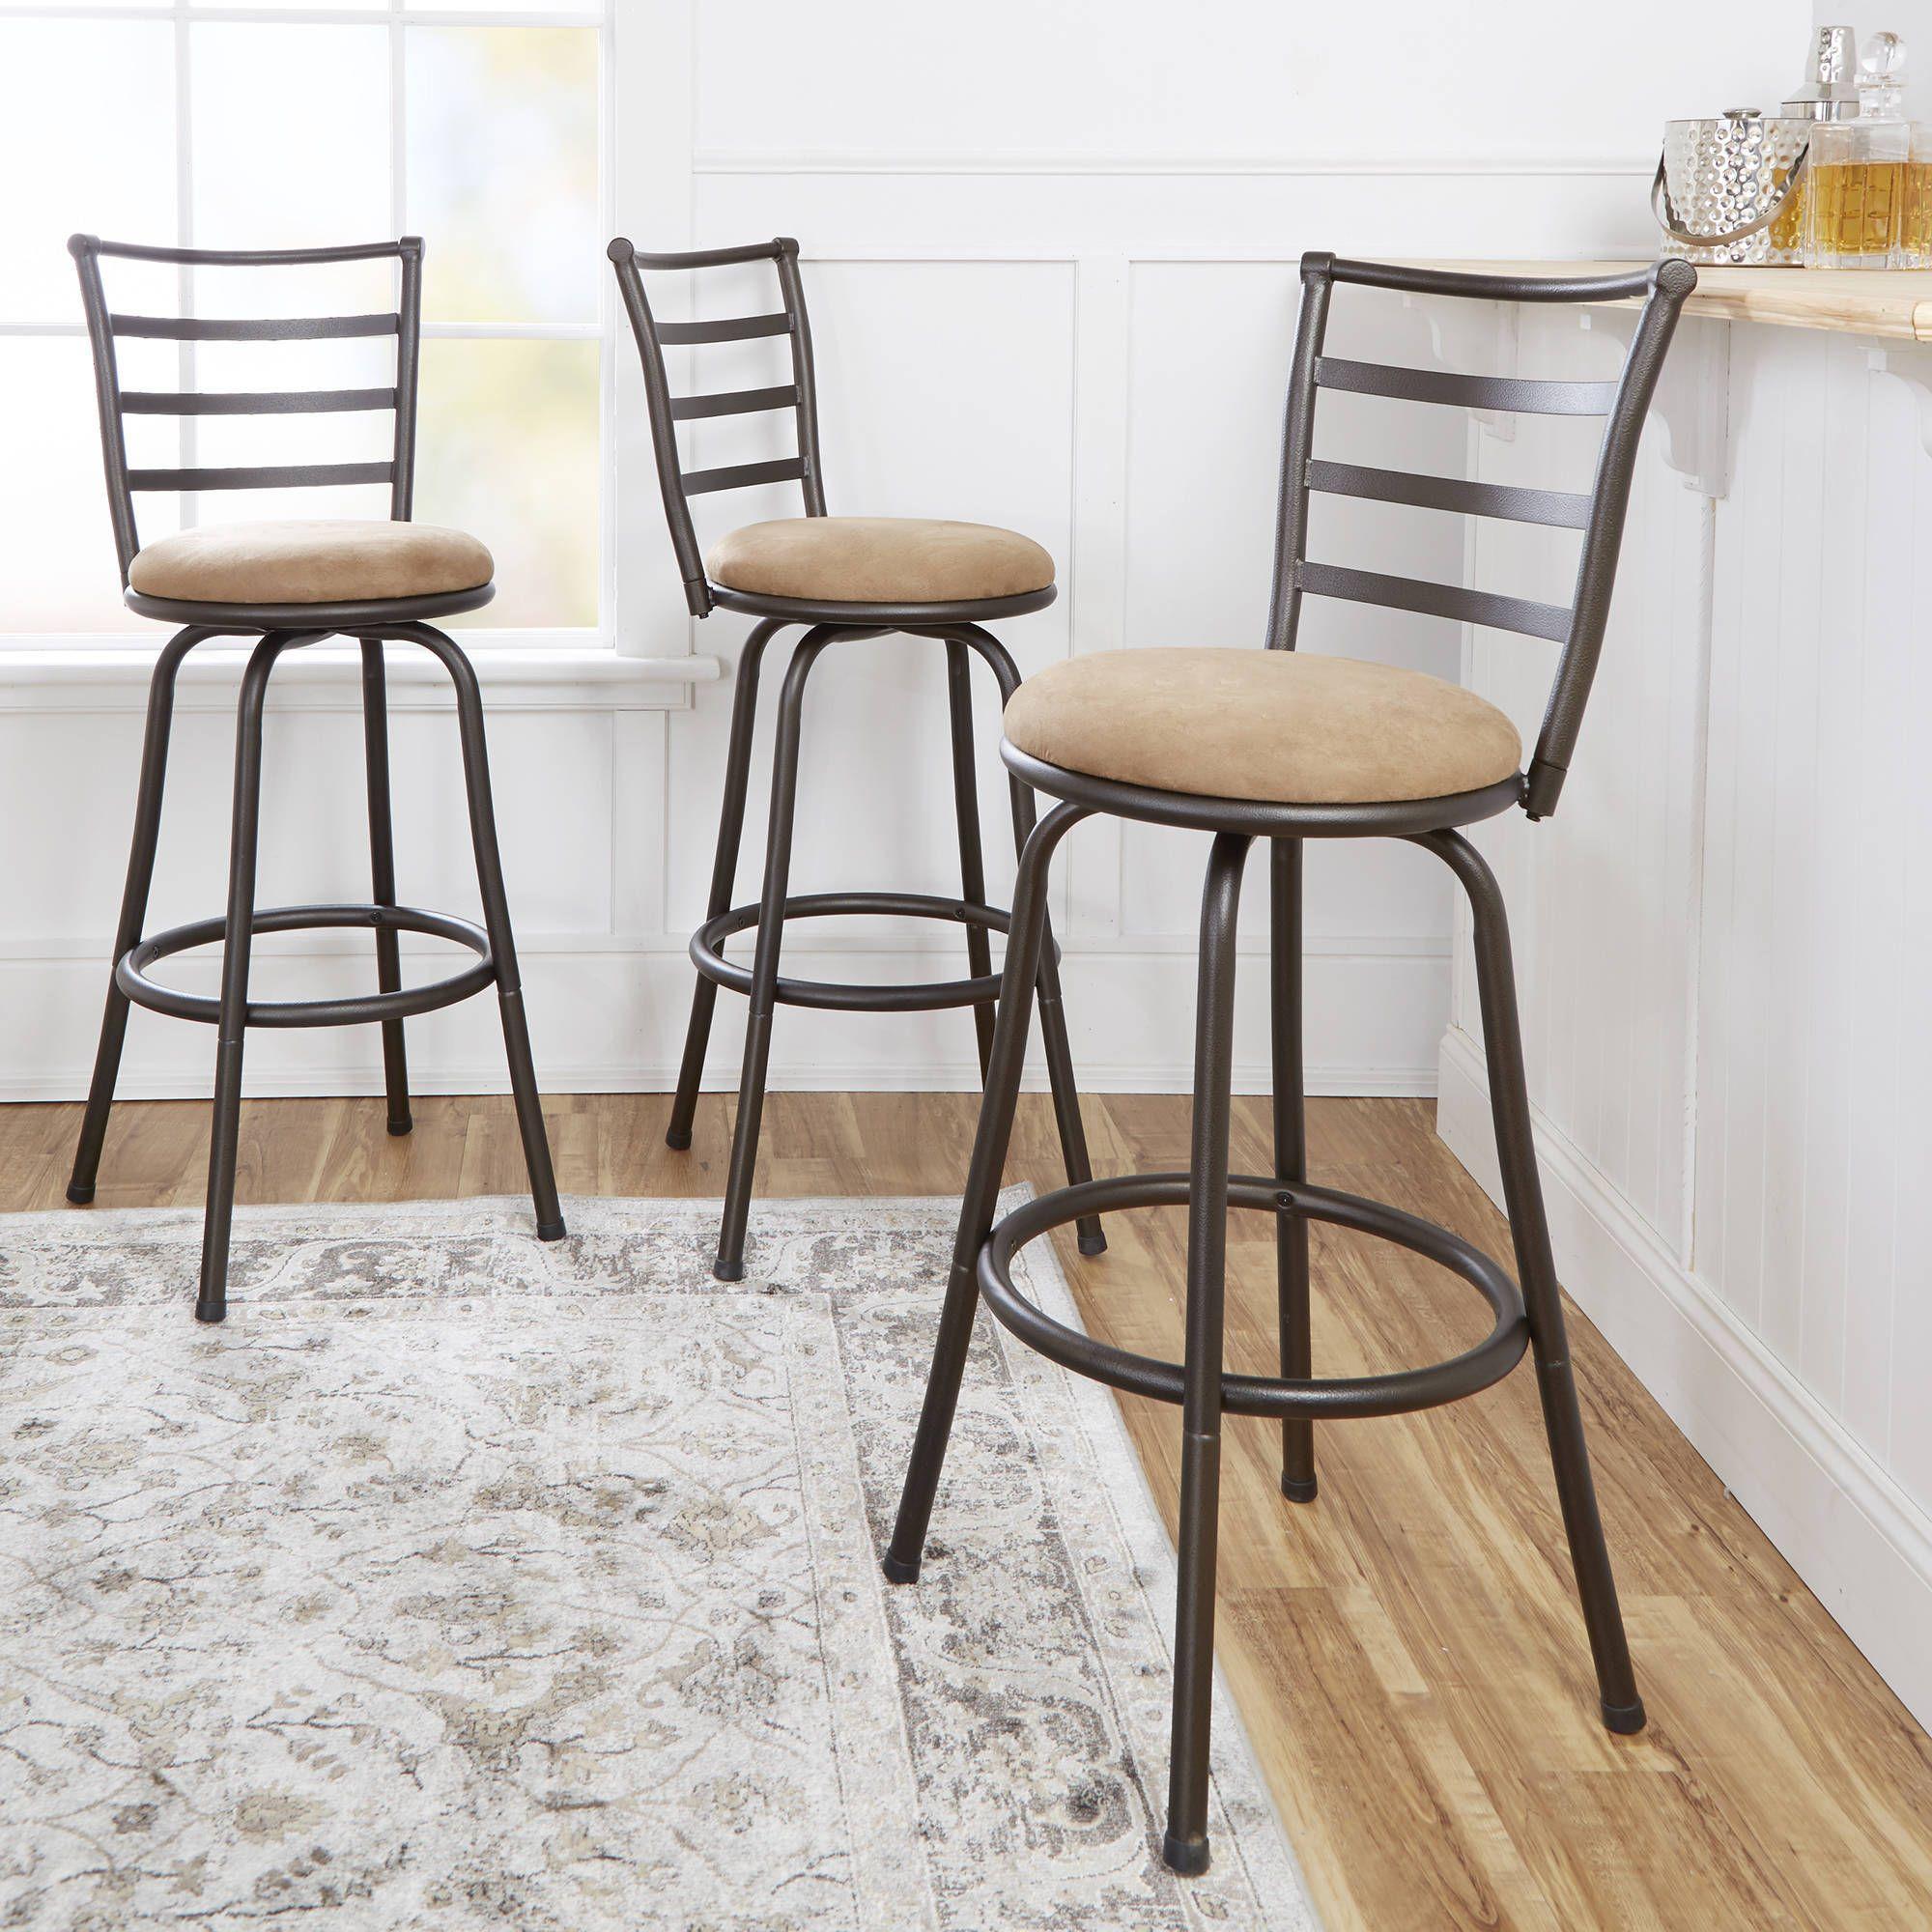 Tremendous Set Of 3 Mainstays Adjustable Height Swivel Barstool Only Ibusinesslaw Wood Chair Design Ideas Ibusinesslaworg